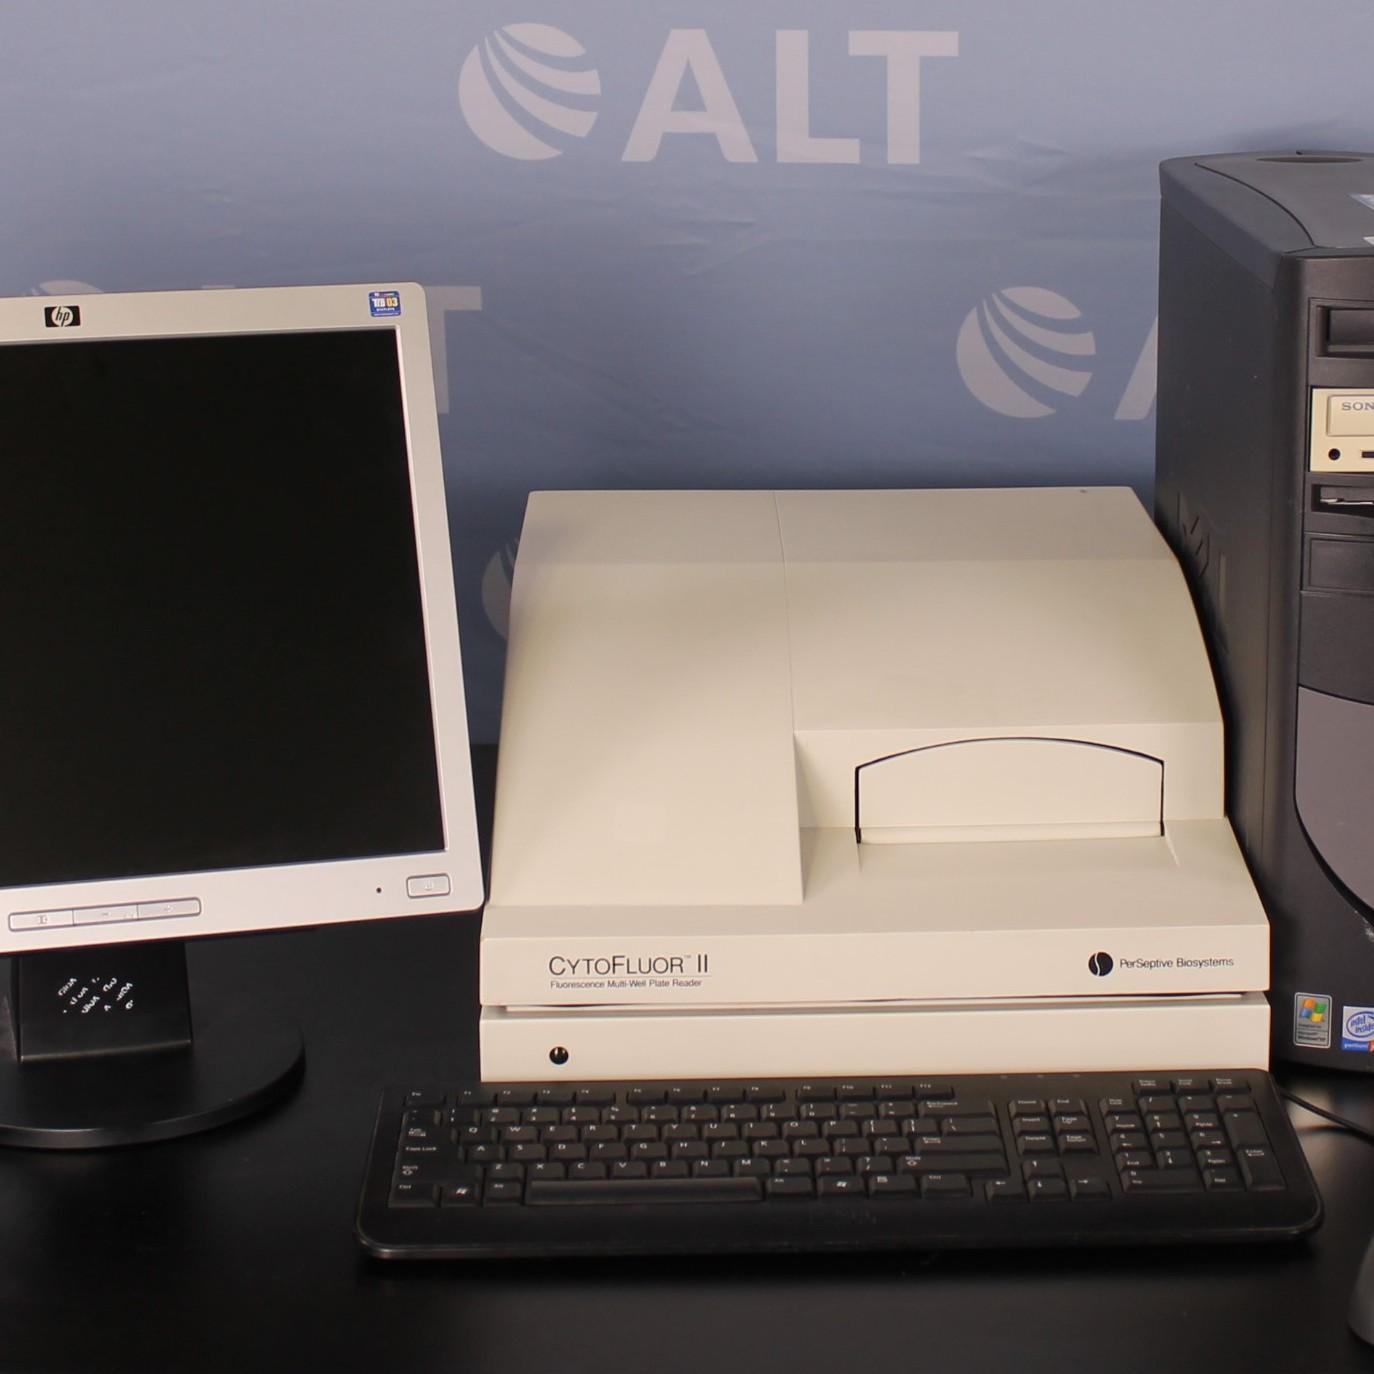 Perseptive Biosystems CytoFluor II Microplate Reader Image